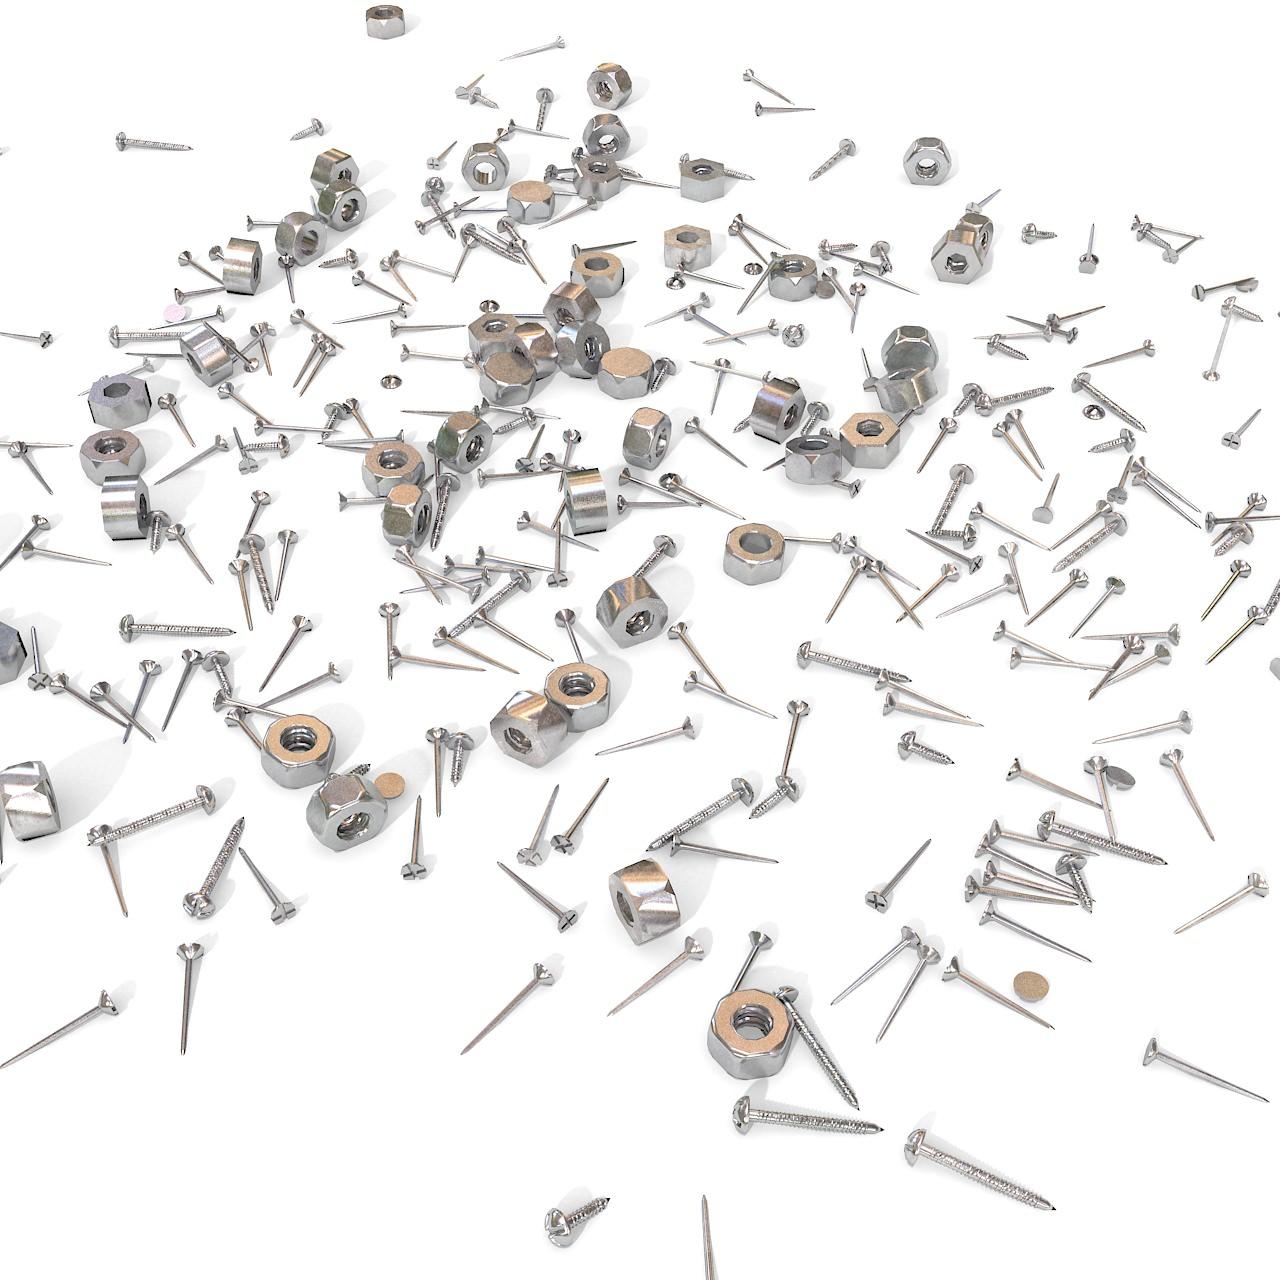 Metallic Rusty Nail And Screw Junk Debris Scrap Industrial